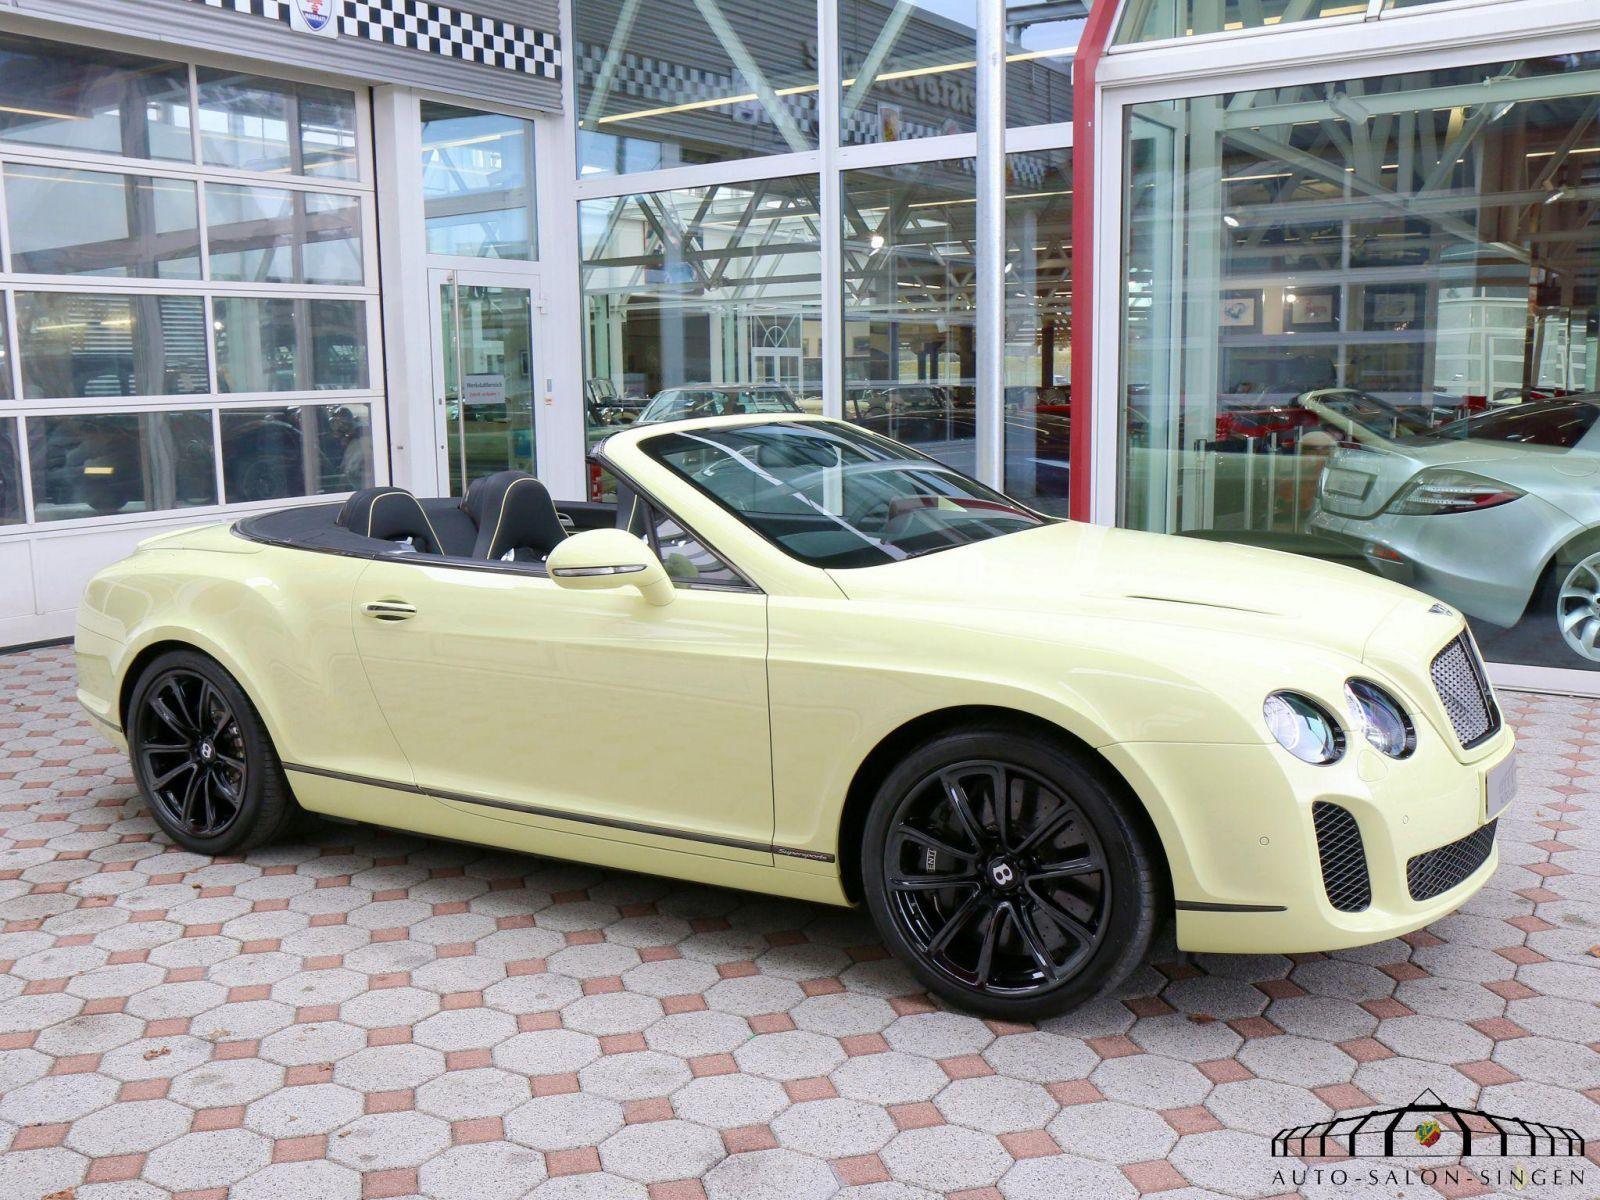 Bentley Auto Salon Singen